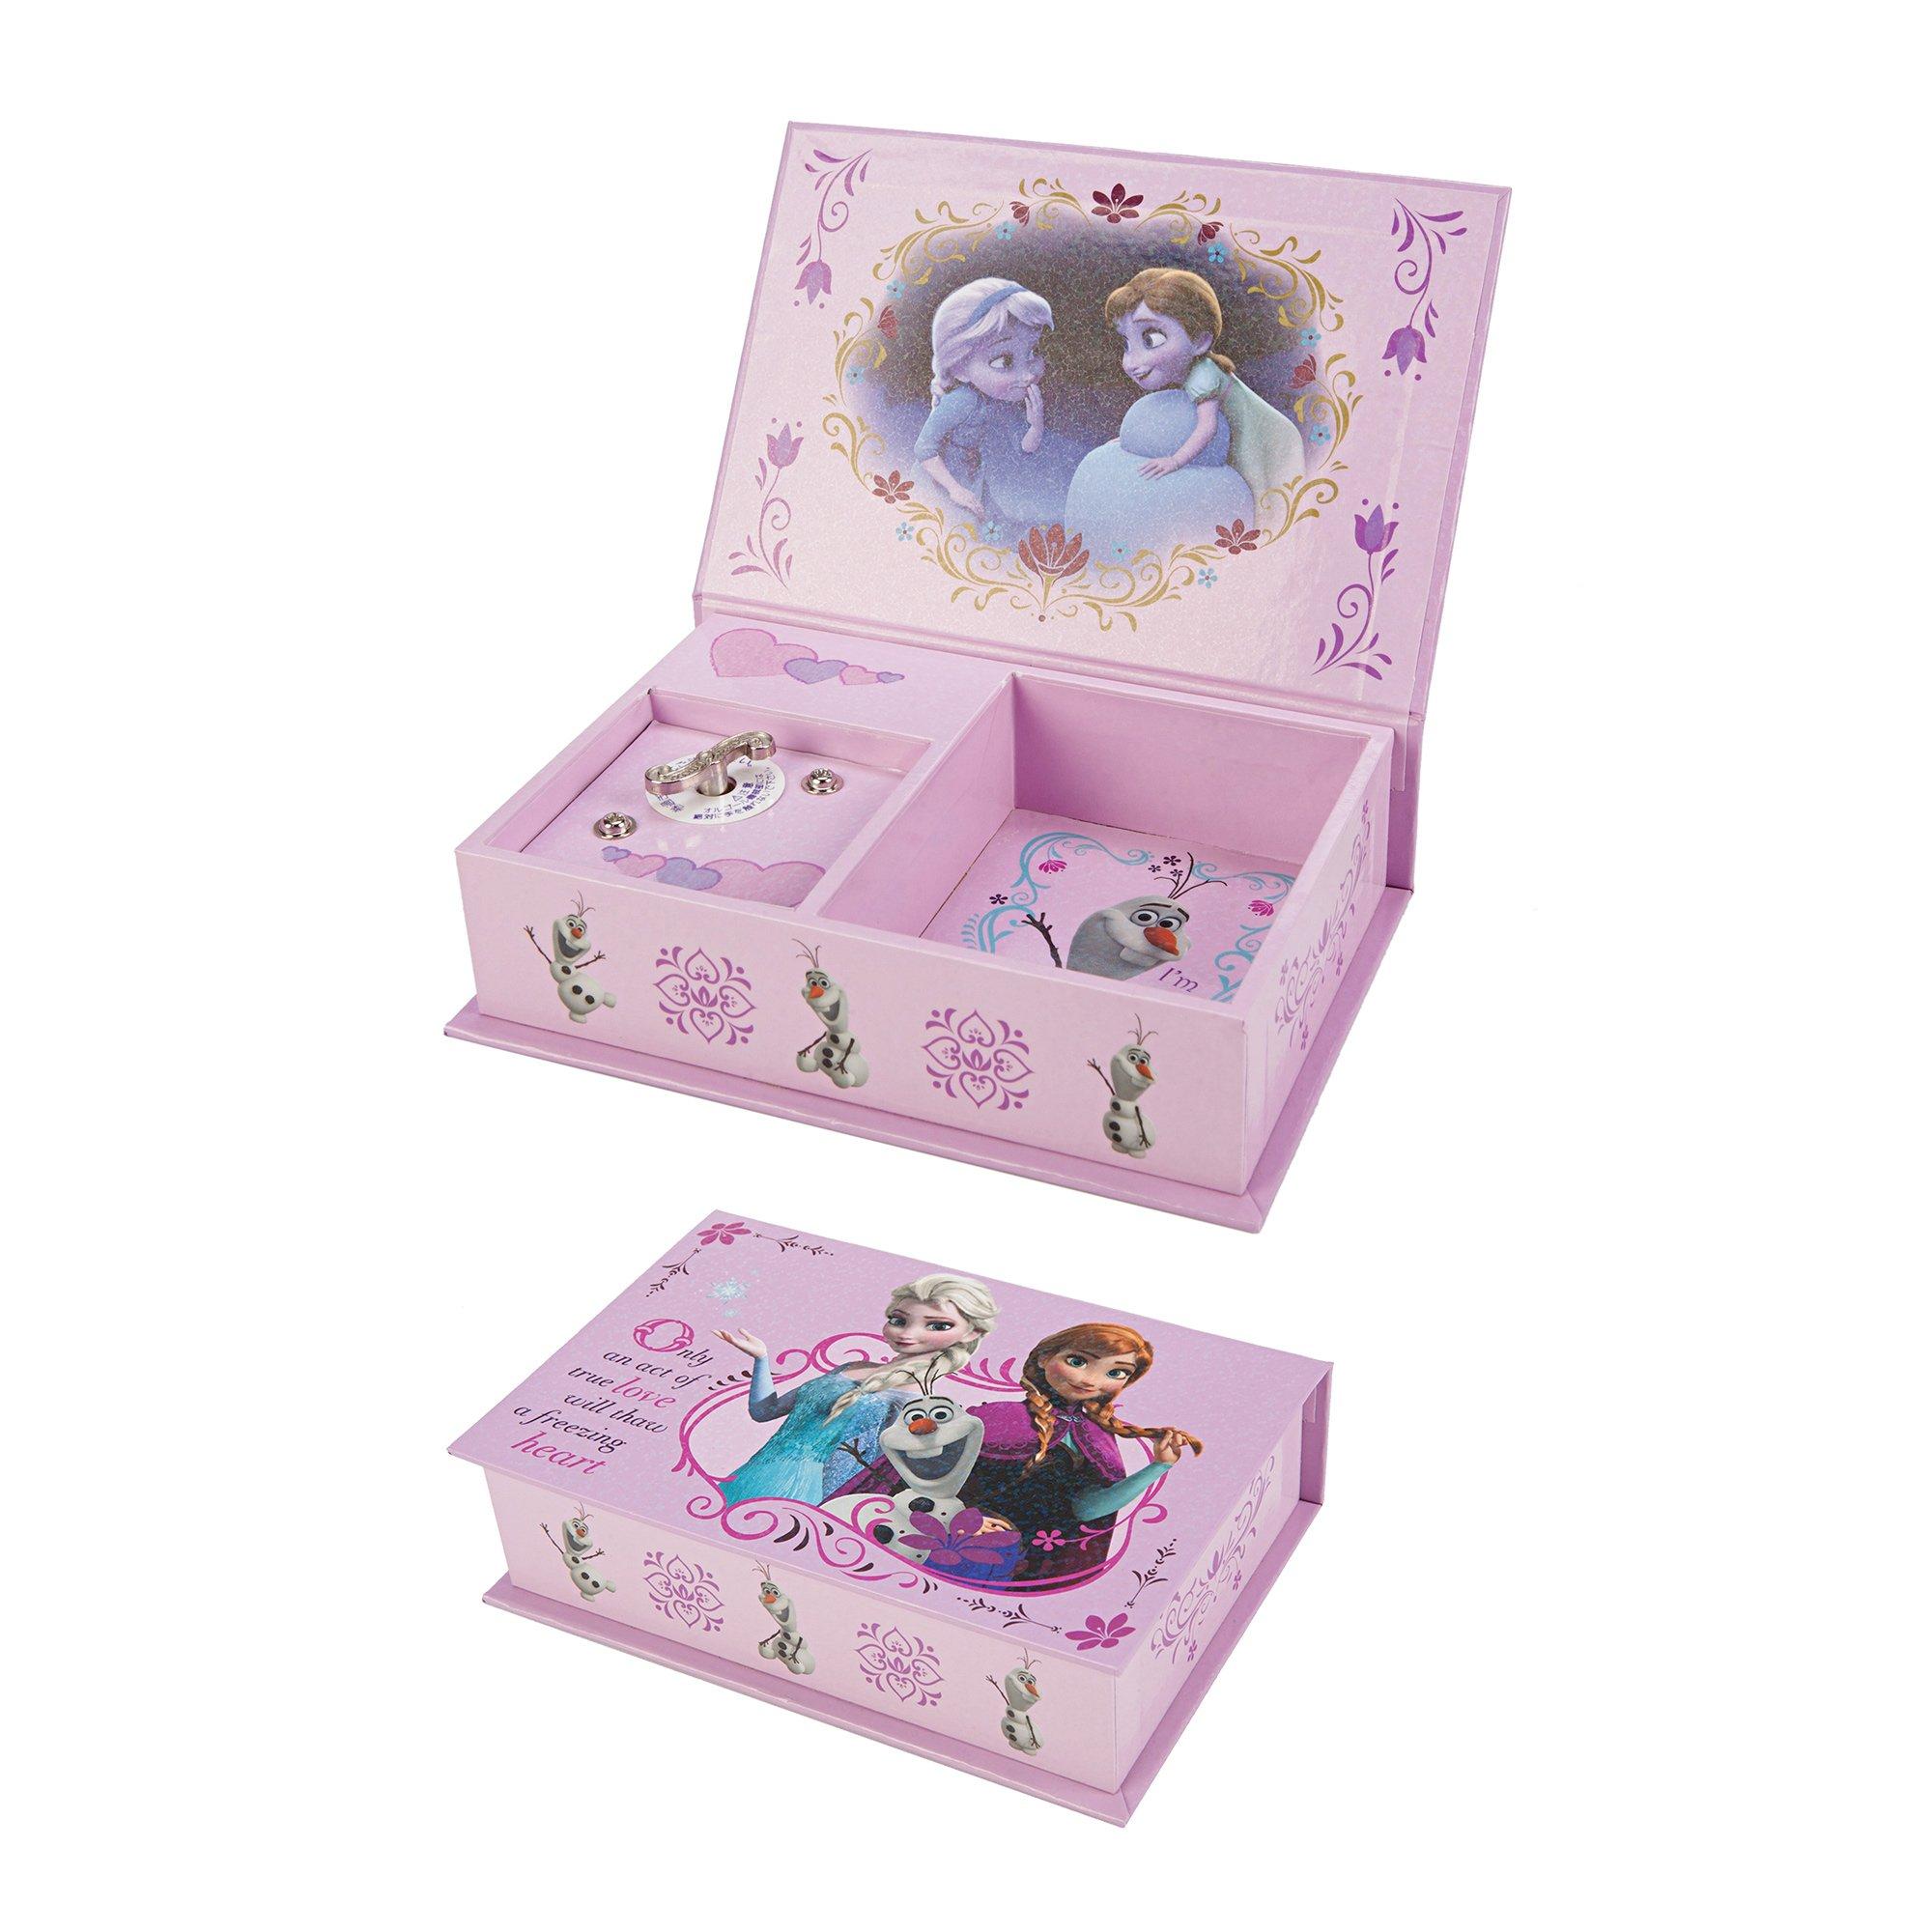 Disney Frozen Anna, Elsa, & Olaf Pink Music Box